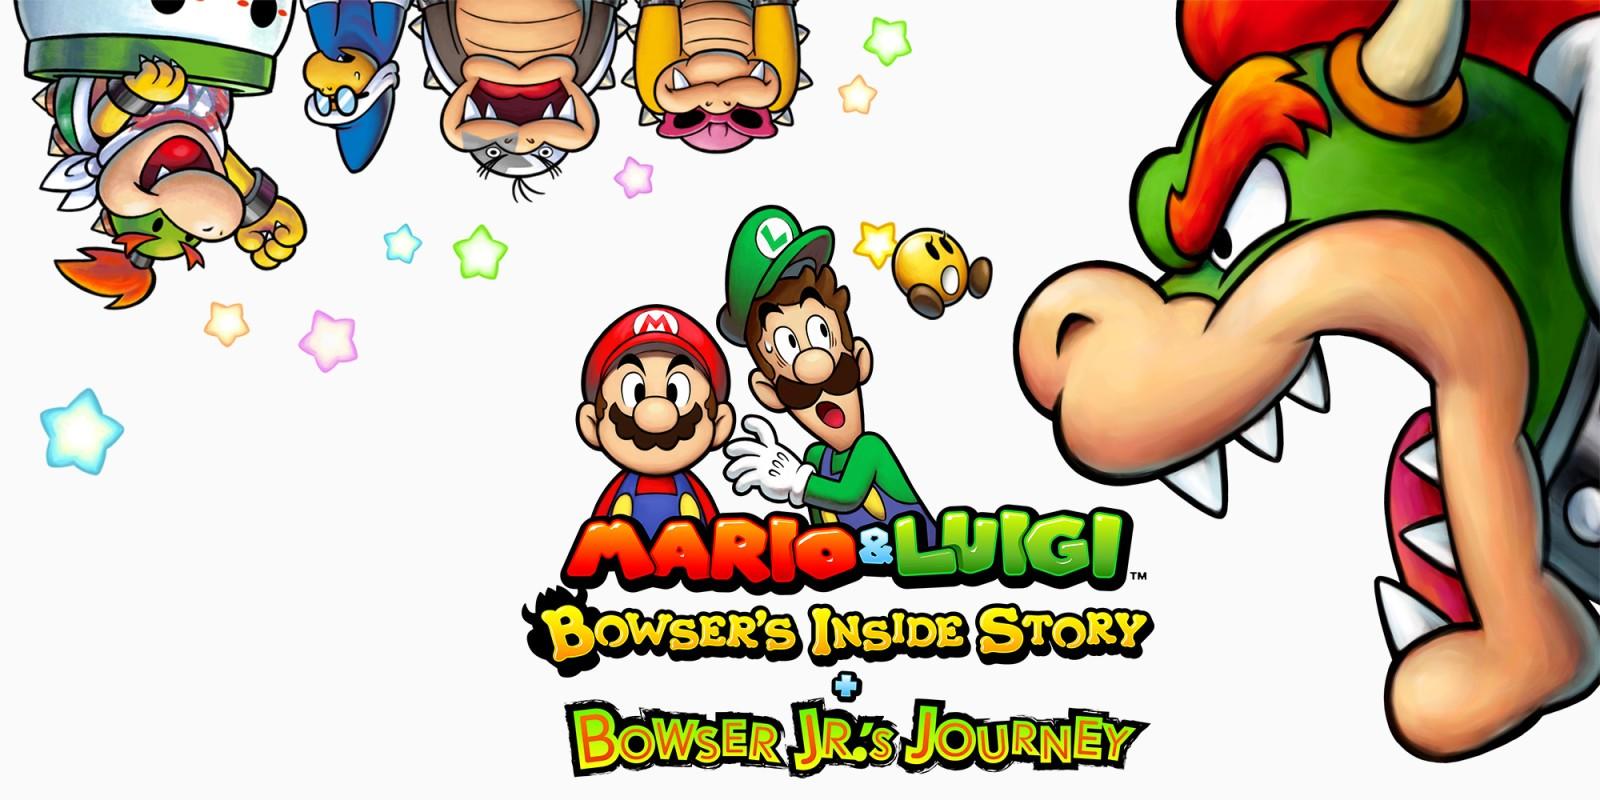 Mario Luigi Bowser S Inside Story Bowser Jr S Journey Nintendo 3ds Games Nintendo